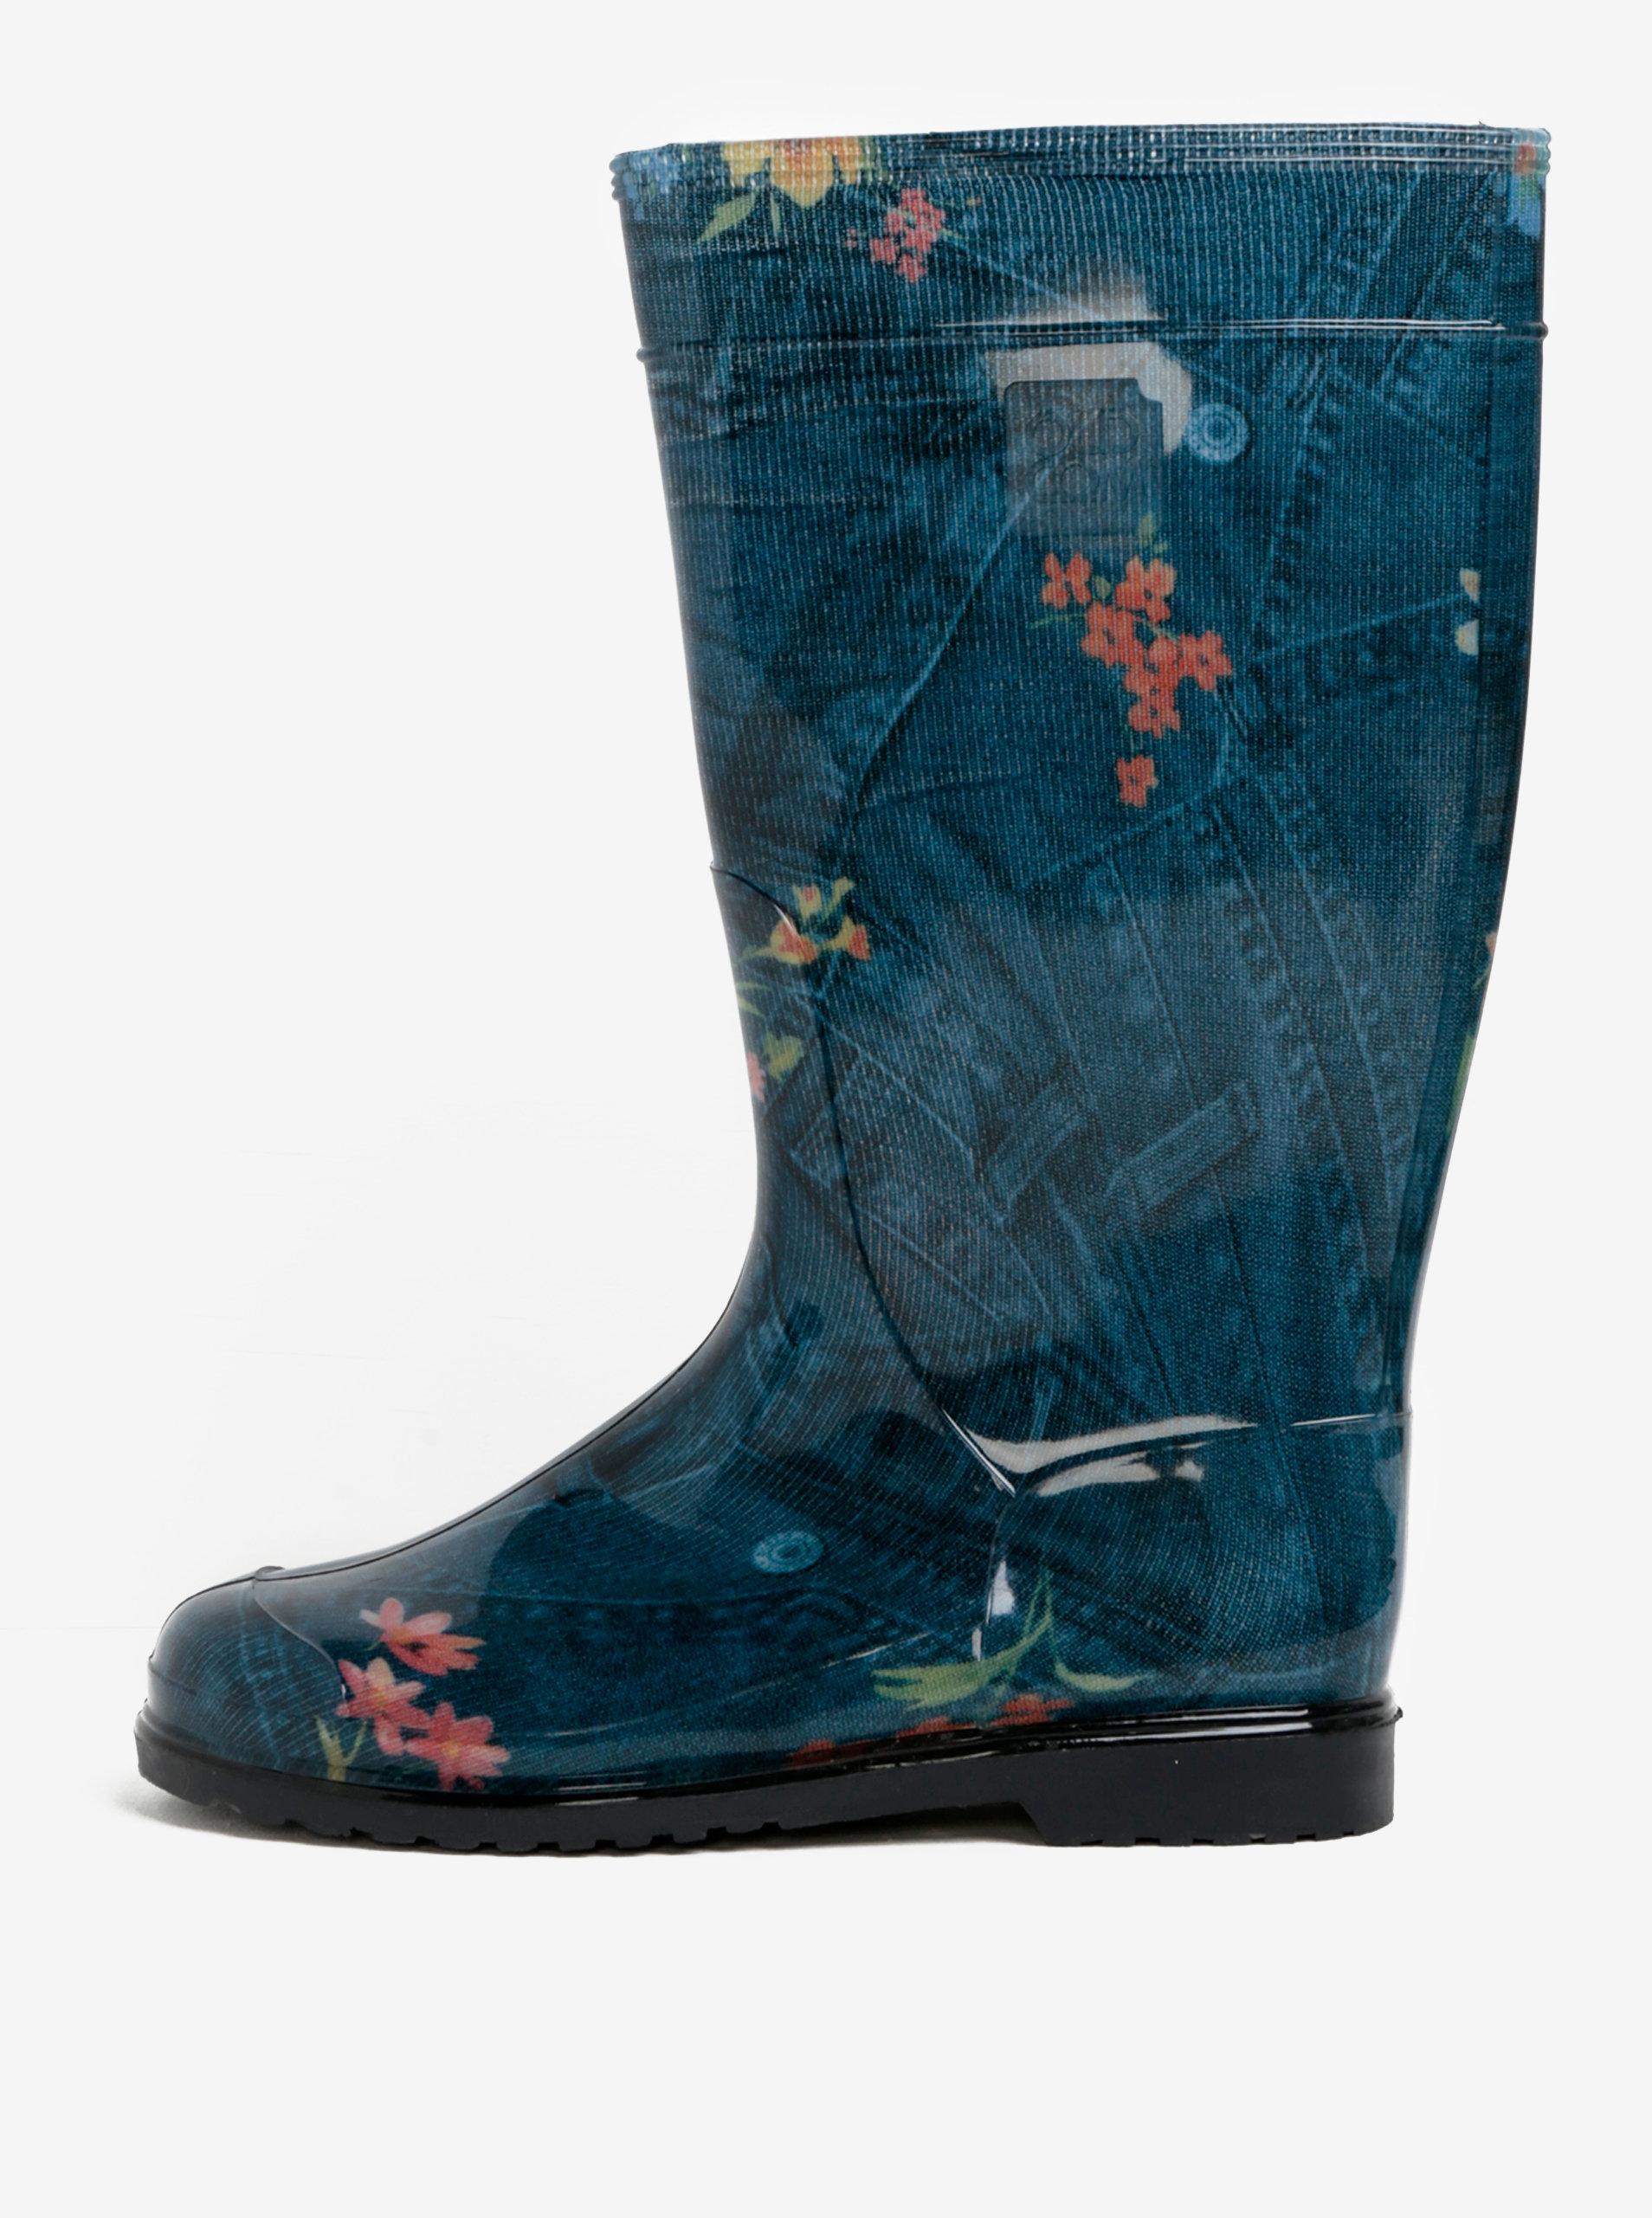 dd130ba03c4f0 Modré dámske gumáky Oldcom Rain | ZOOT.sk